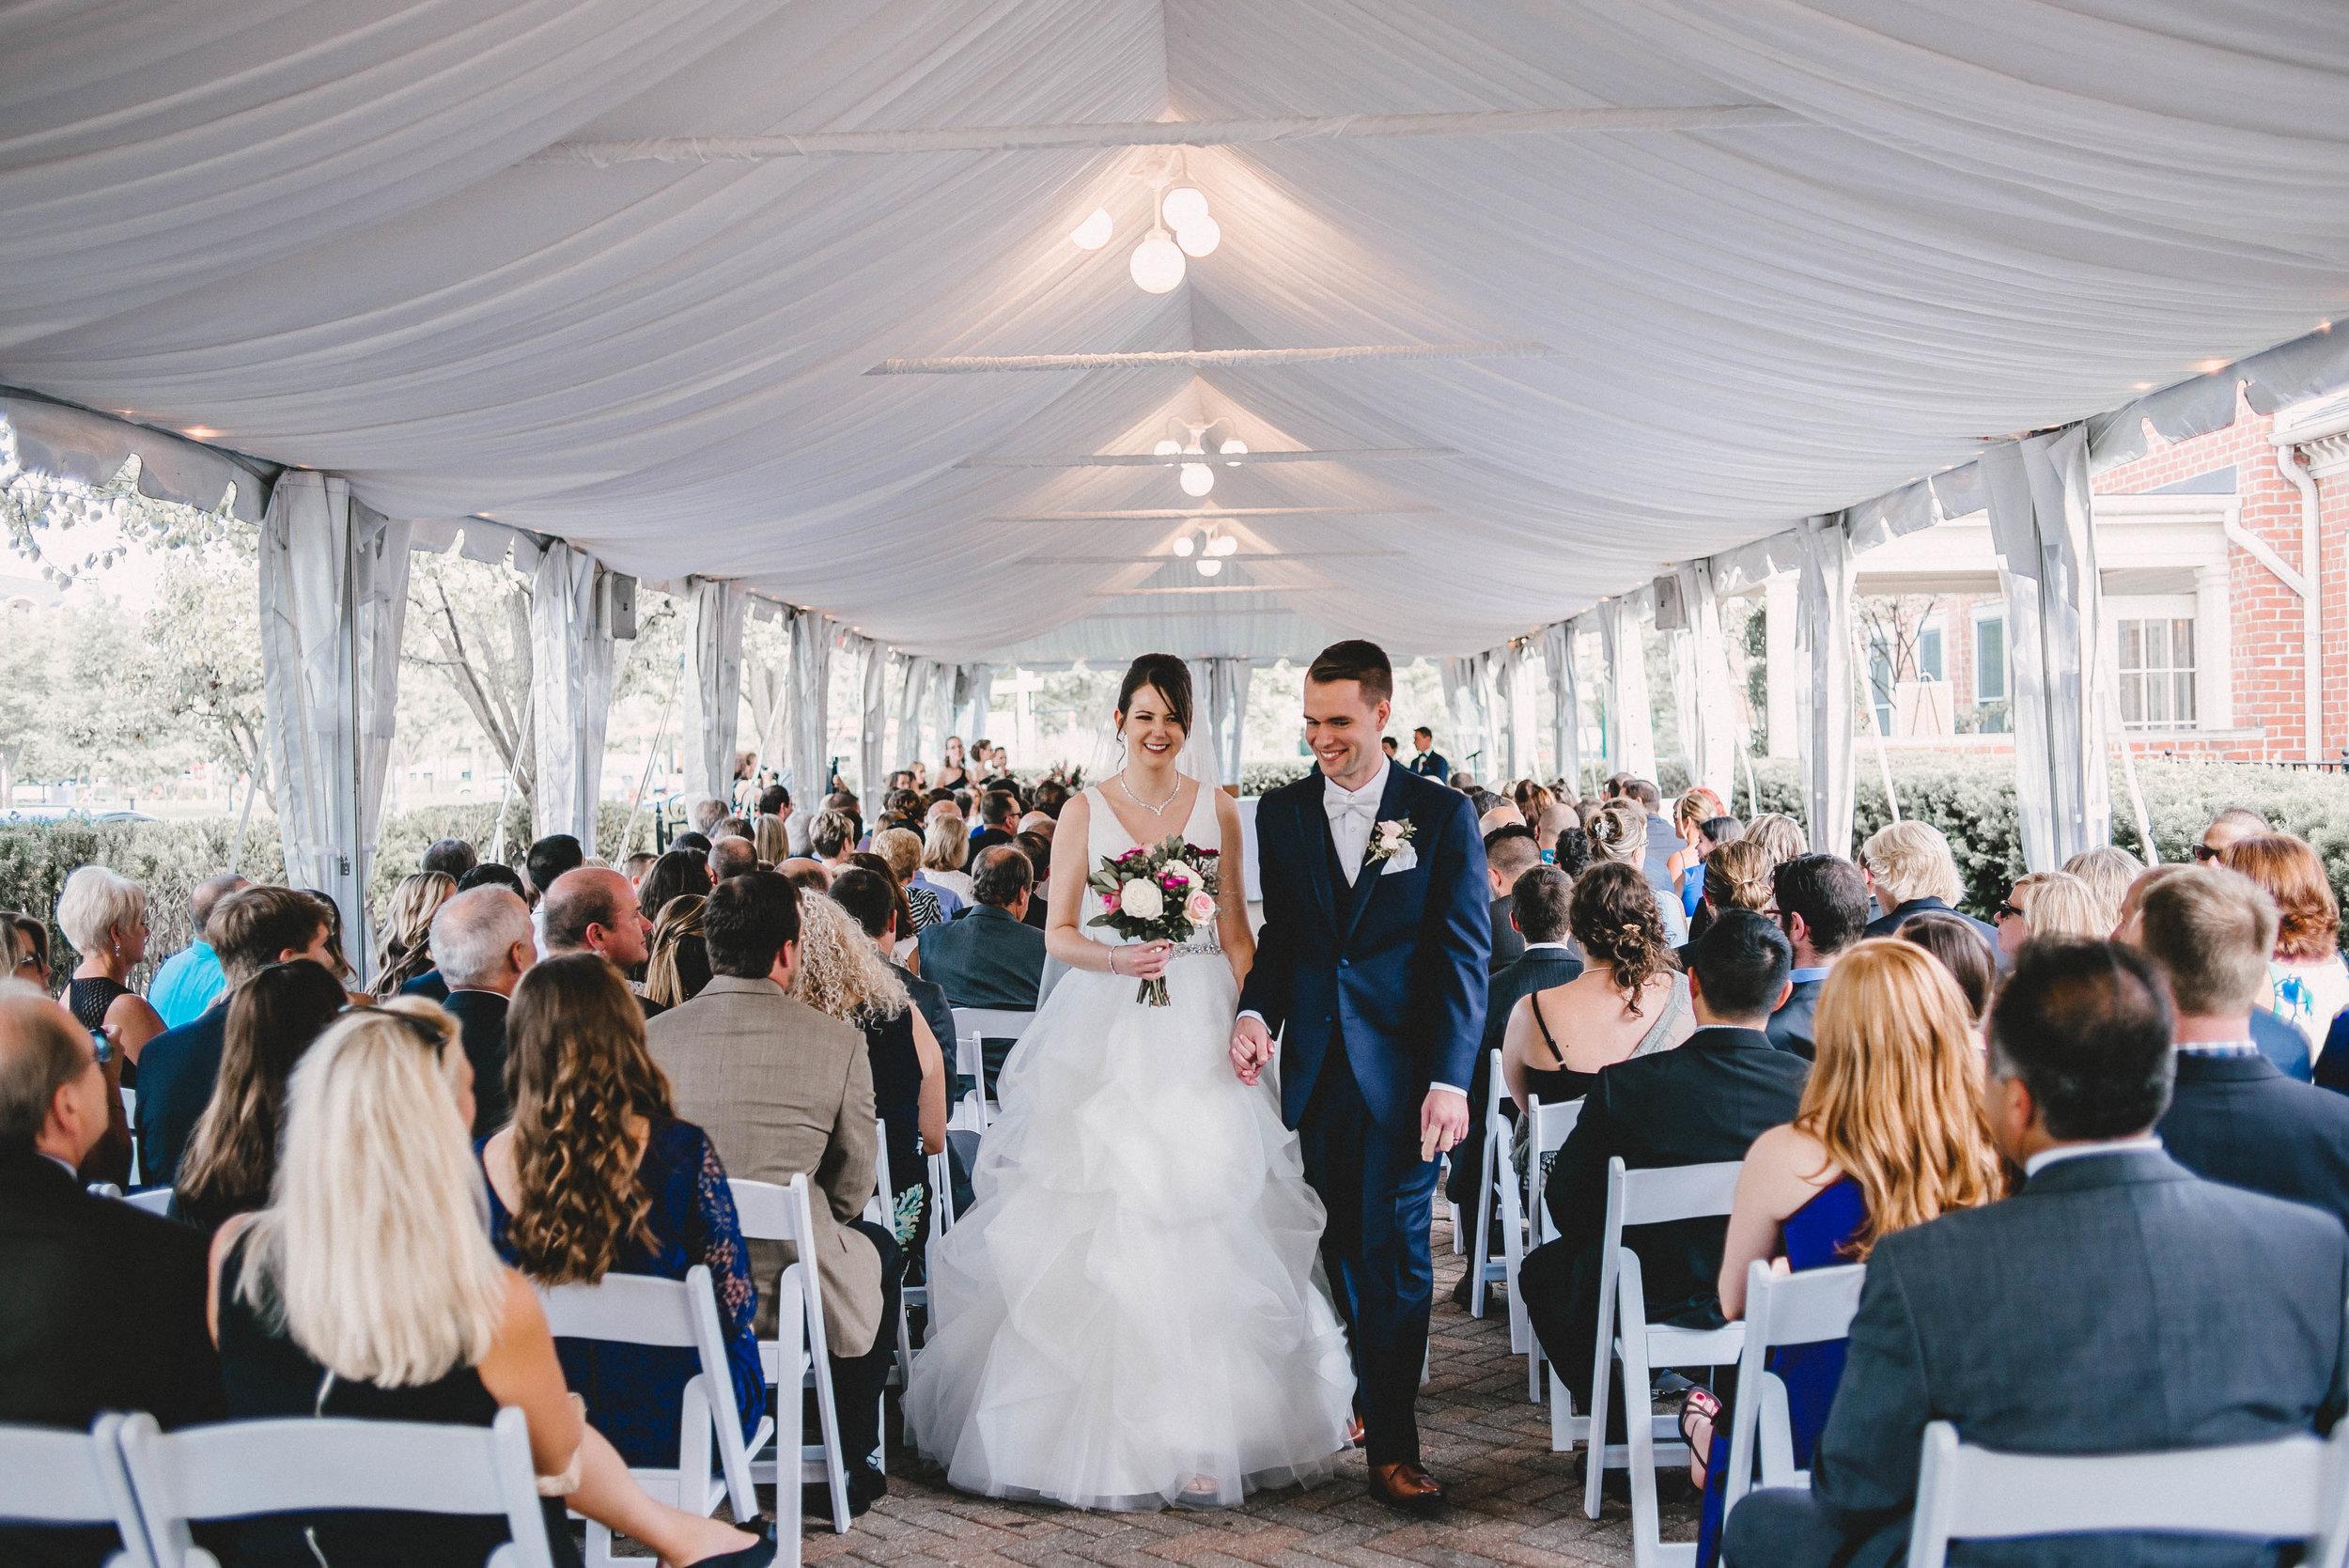 Kara and Mike Wedding-20160904-16-39-20.jpg